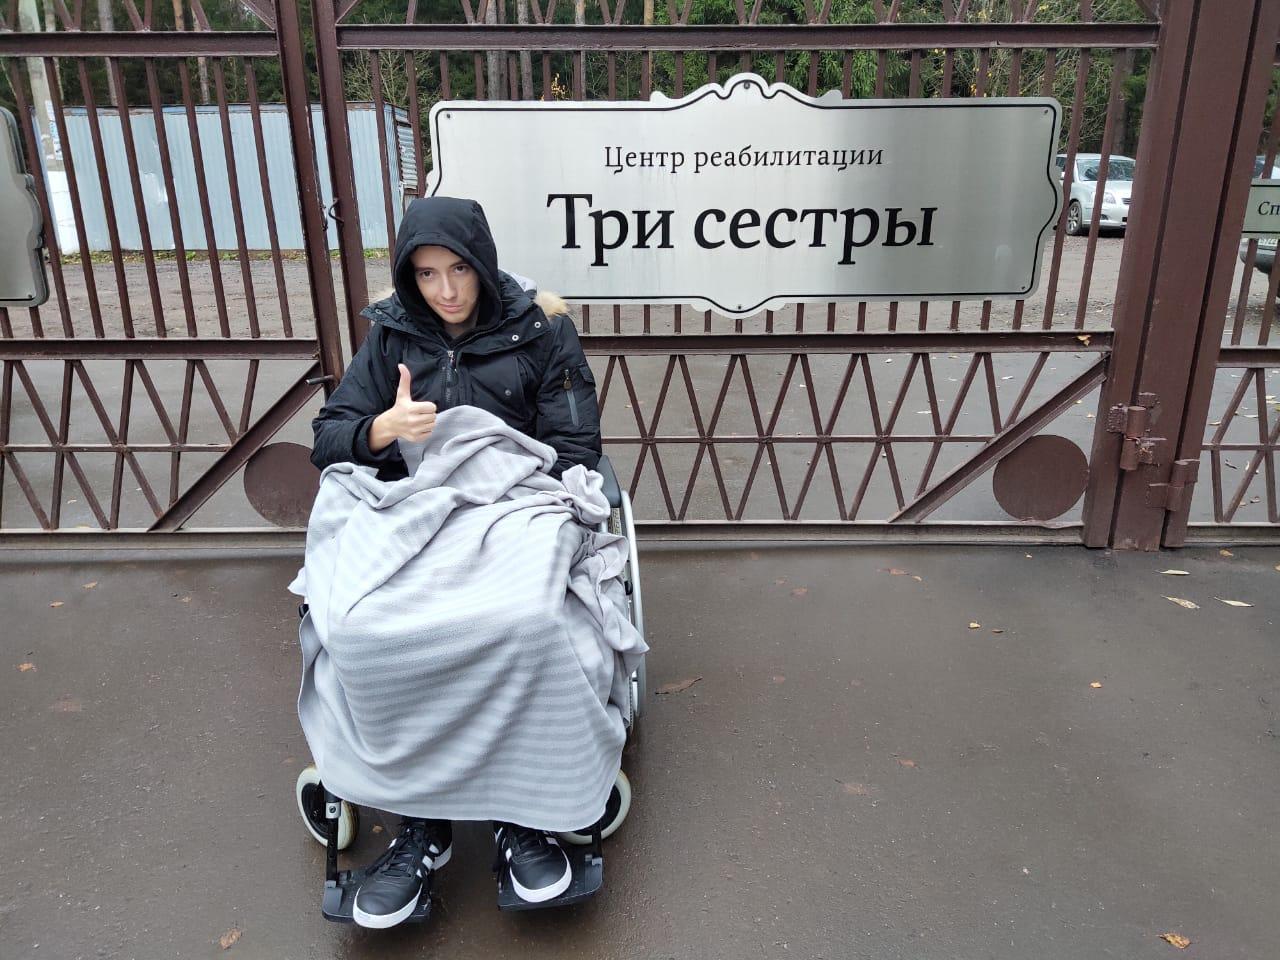 Реабилитация Славы!